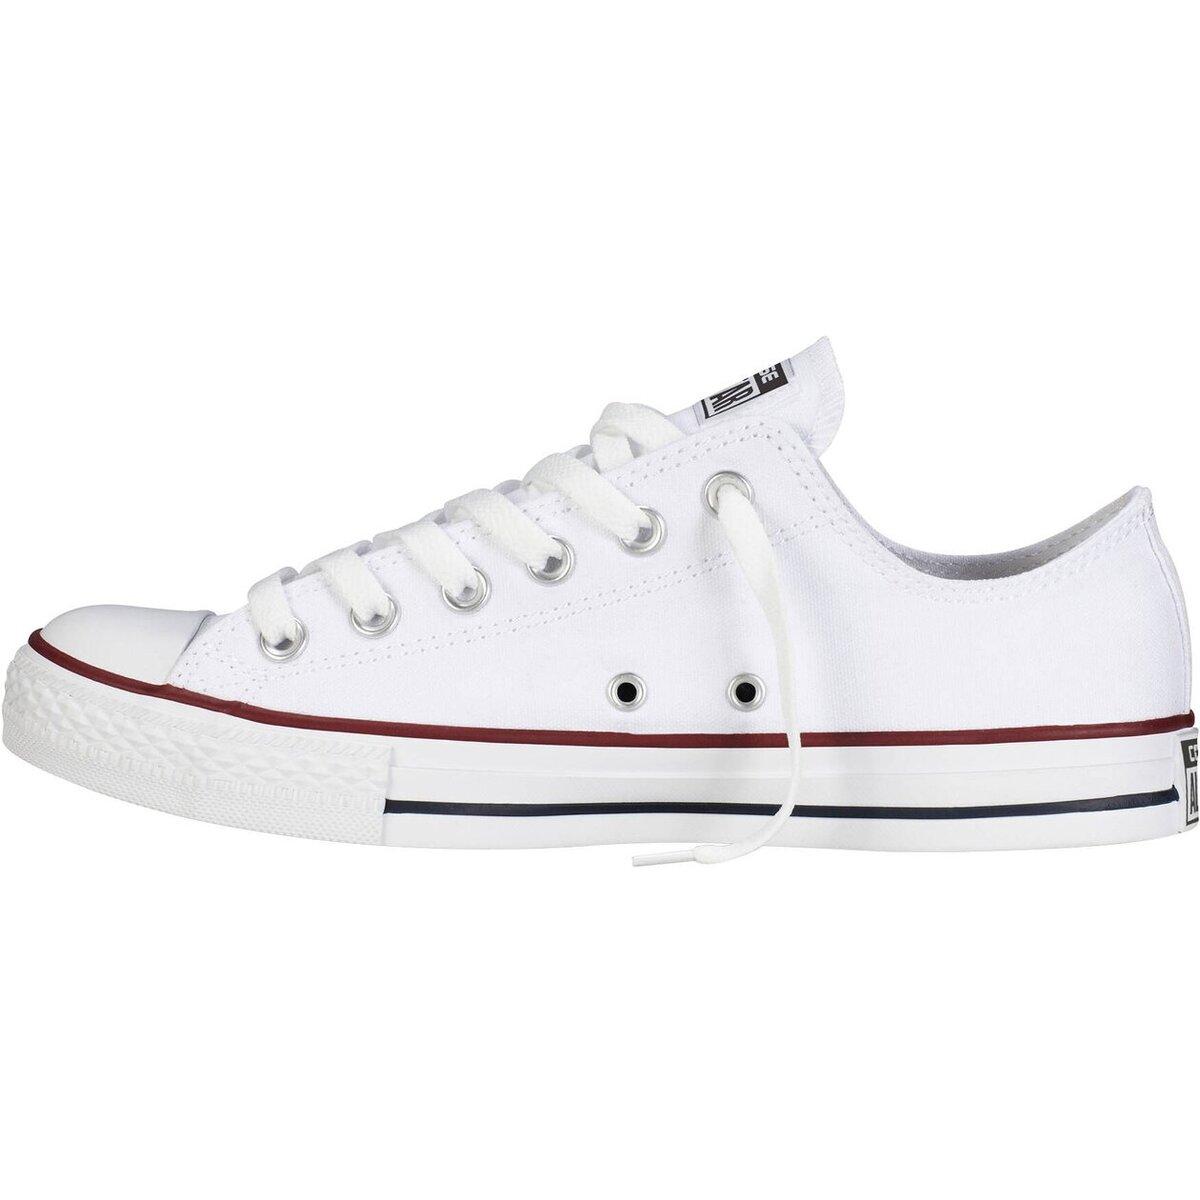 Bild 2 von CONVERSE Sneaker AS Core OX - optical white